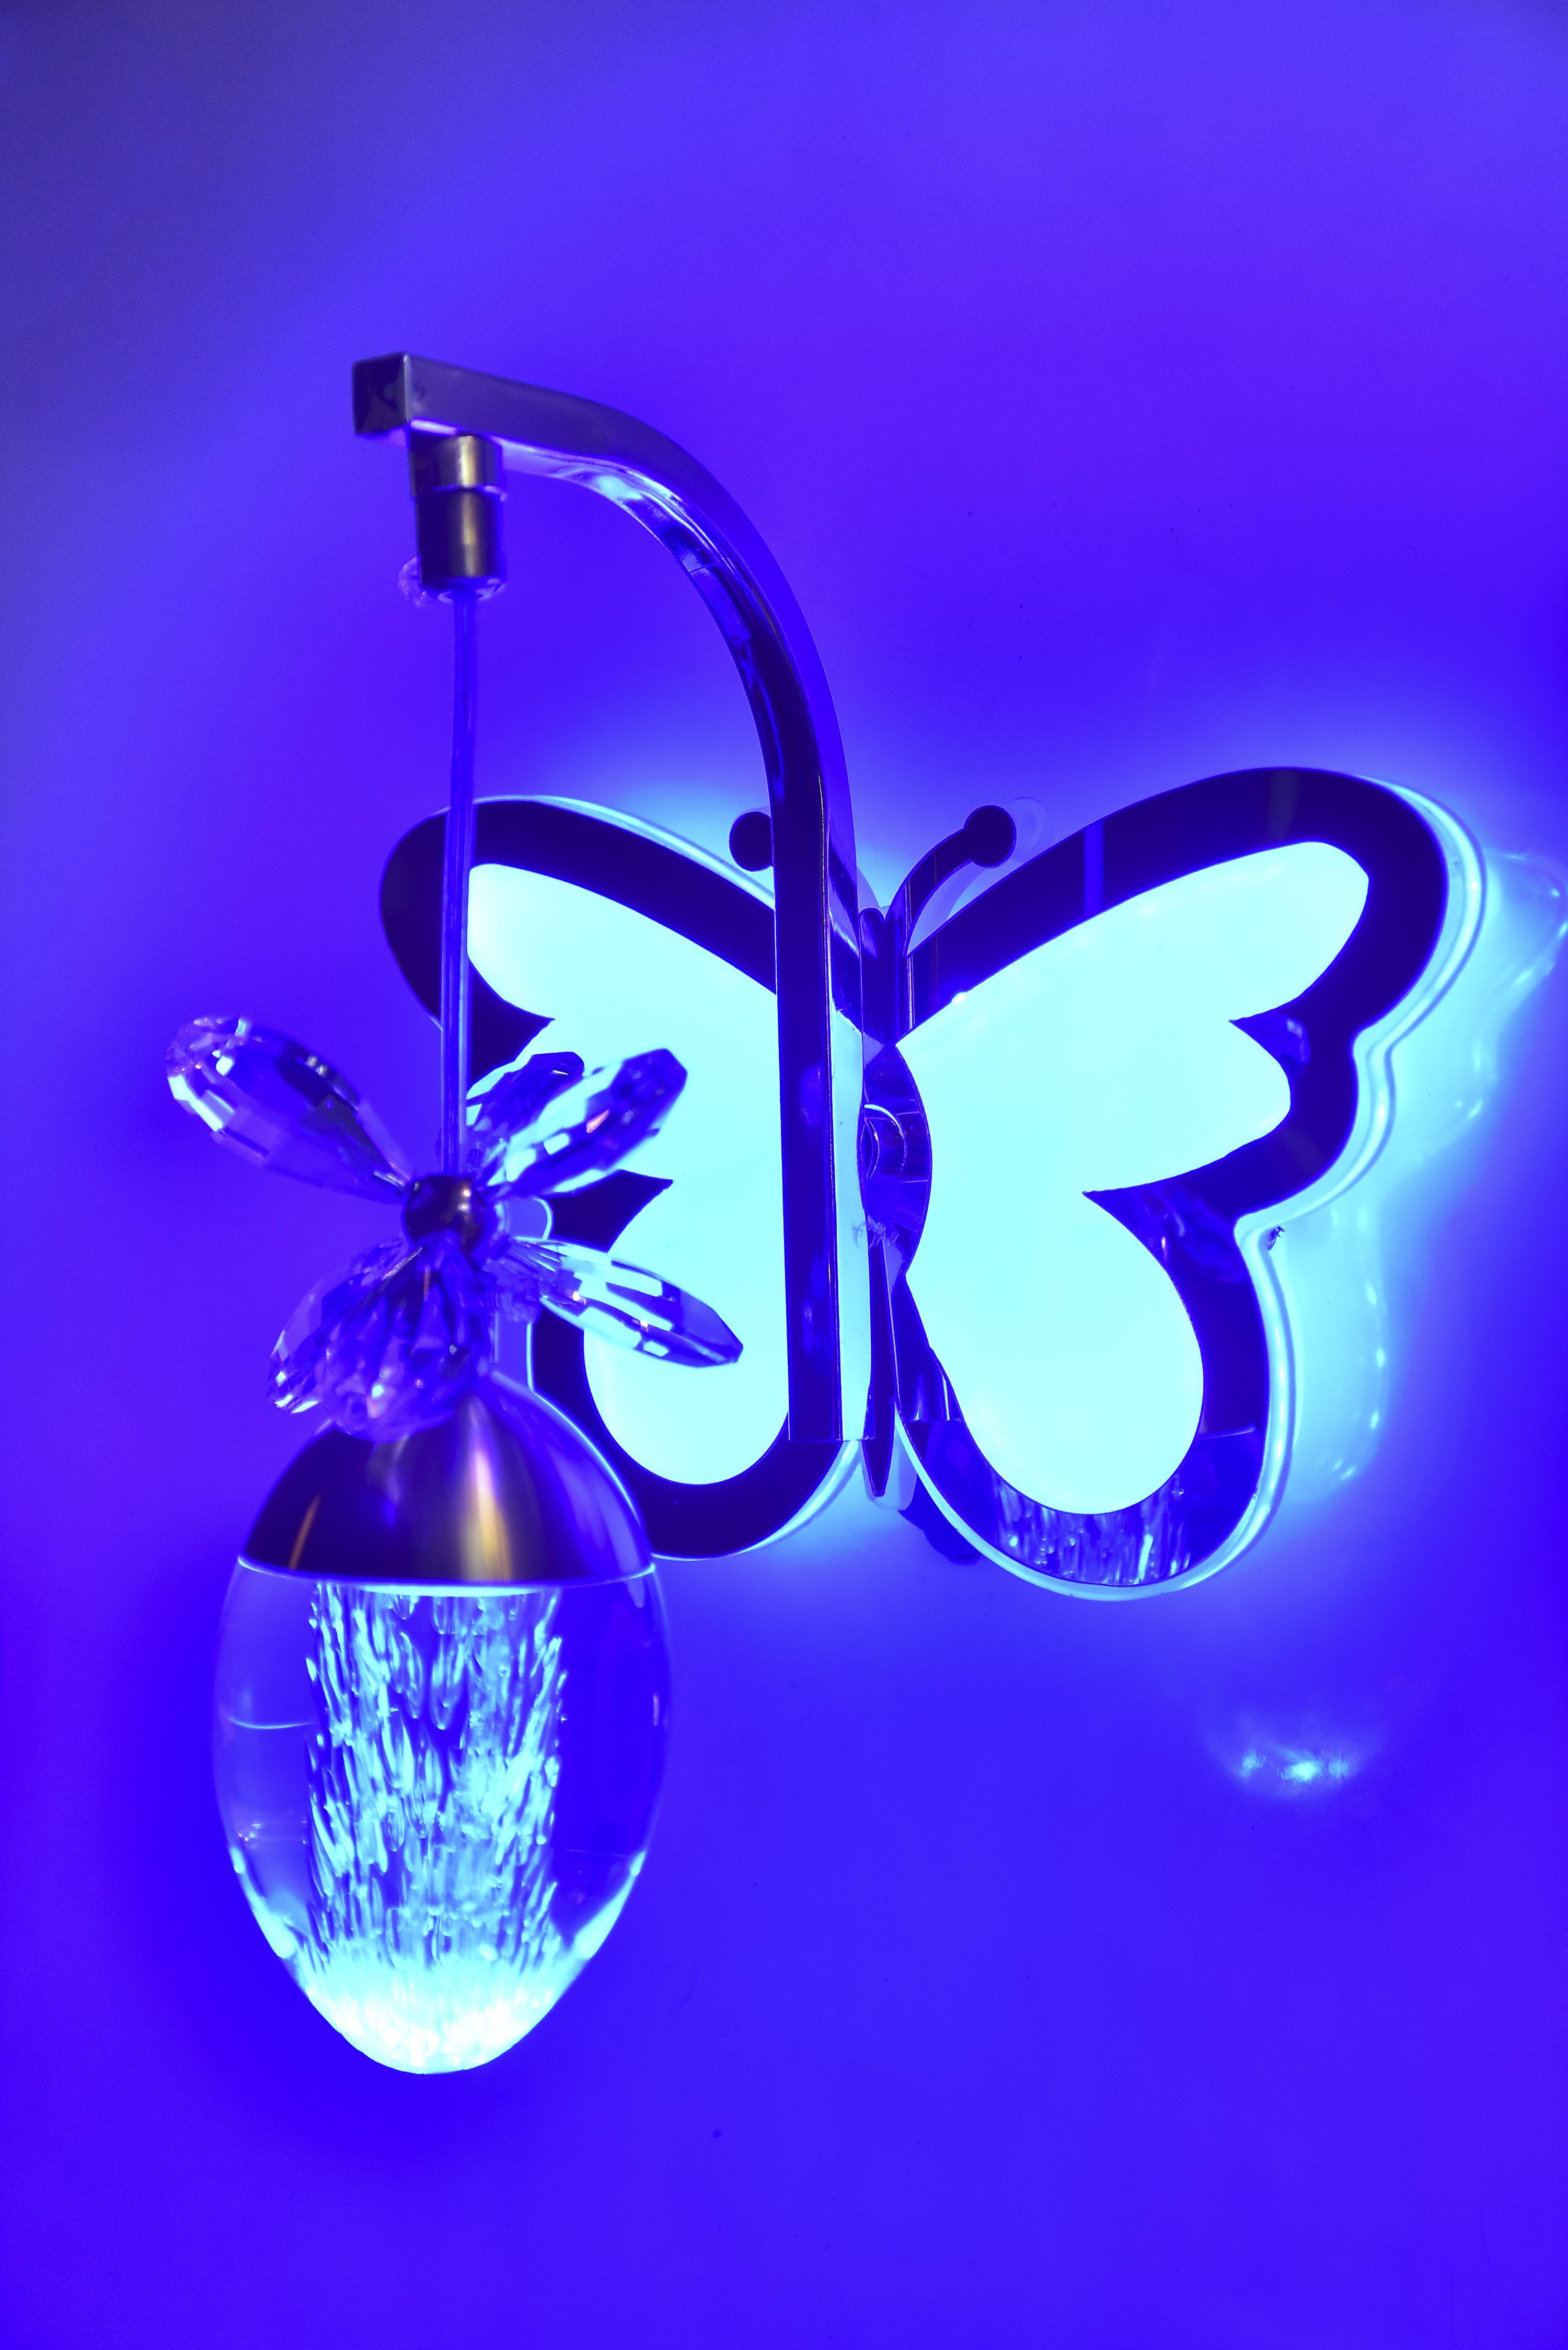 Butterfly  Downward